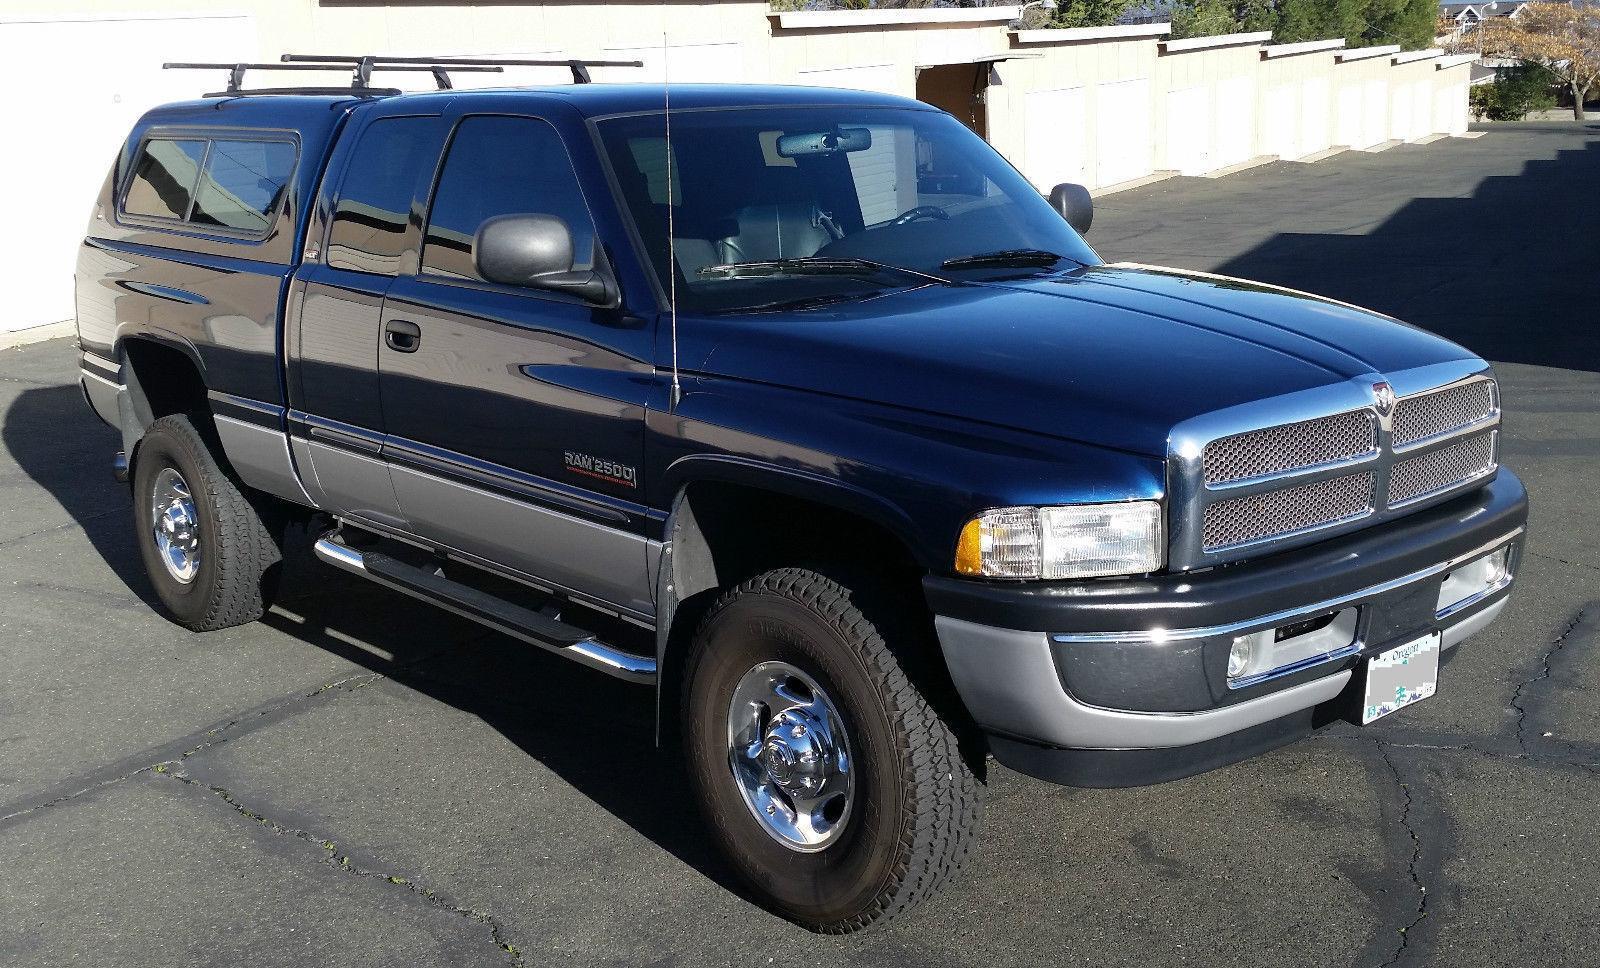 fully loaded 2001 Dodge Ram 2500 SLT lifted